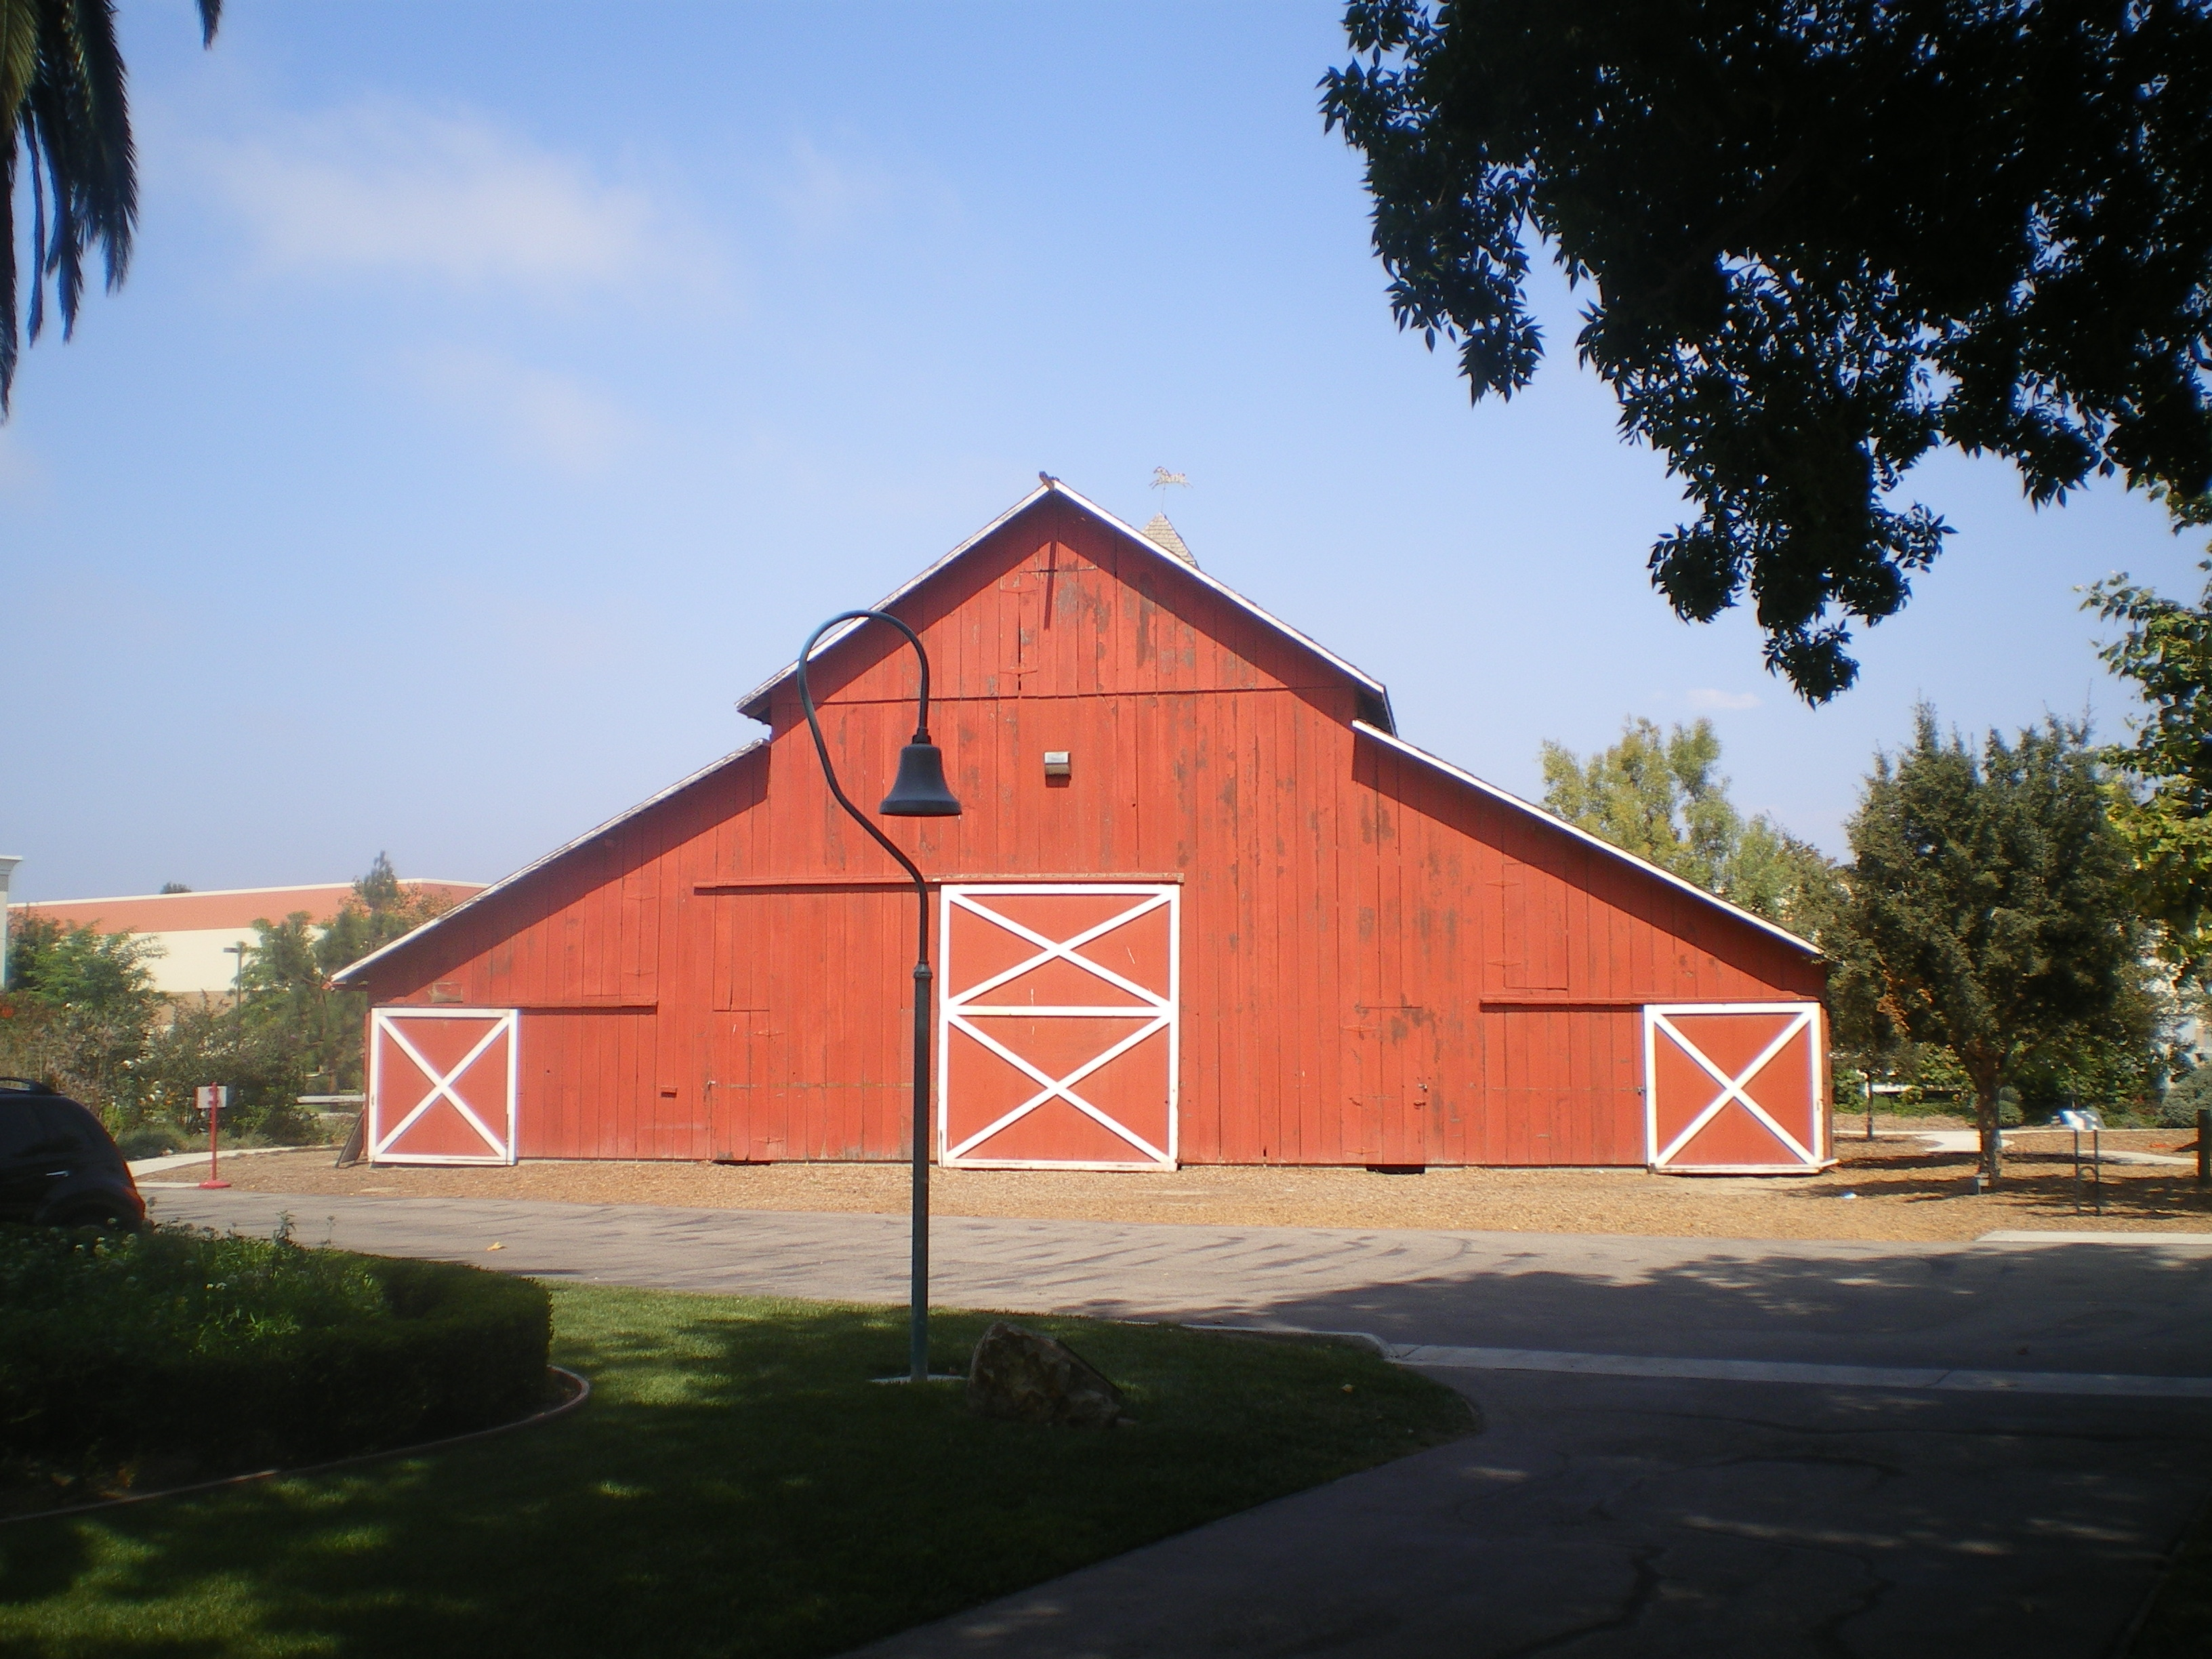 File Camarillo Ranch House Barn Jpg Wikimedia Commons